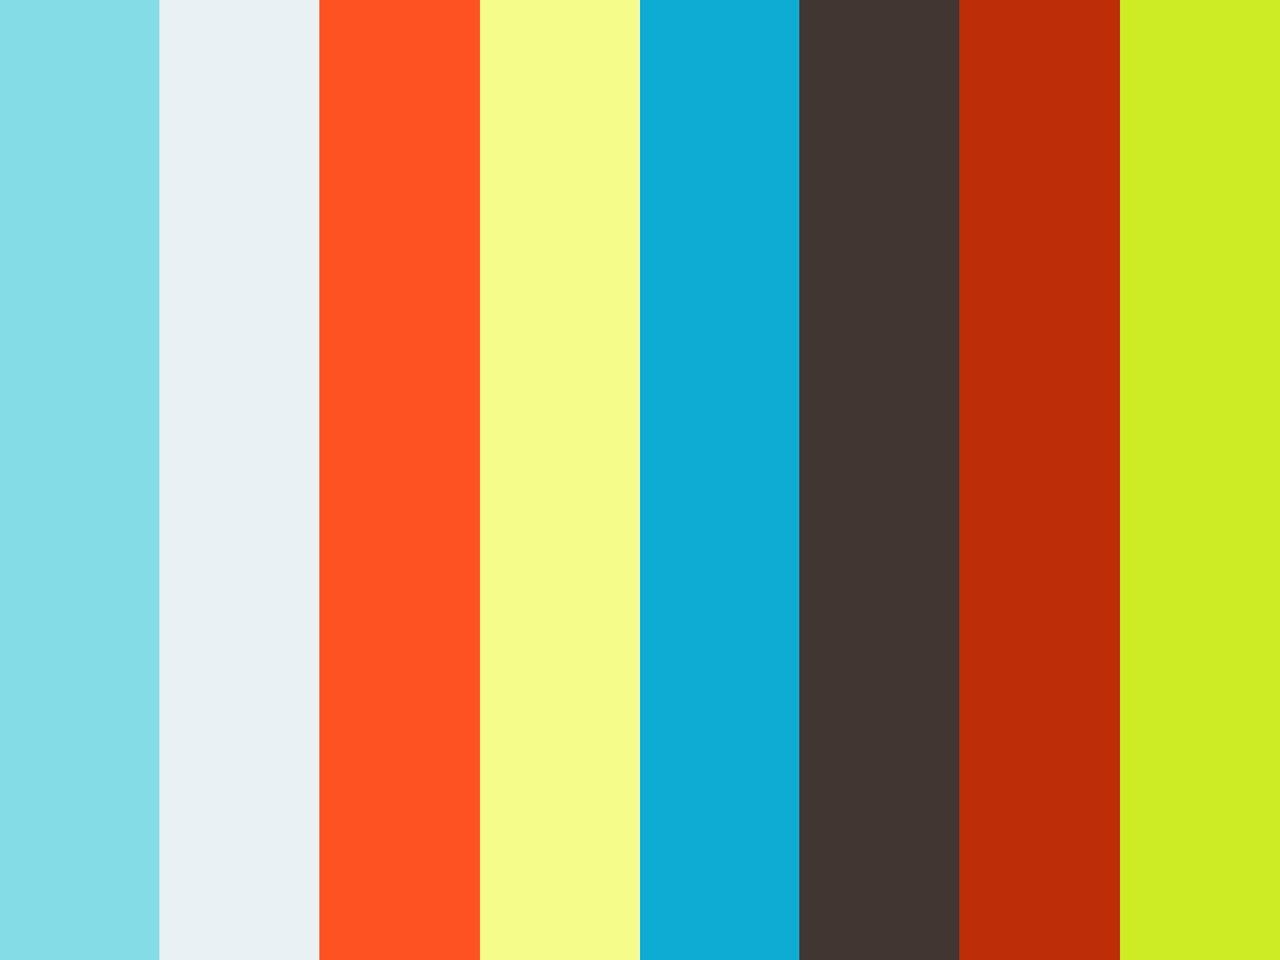 WhyDesign, Roisin Lafferty, Kingston Lafferty Design